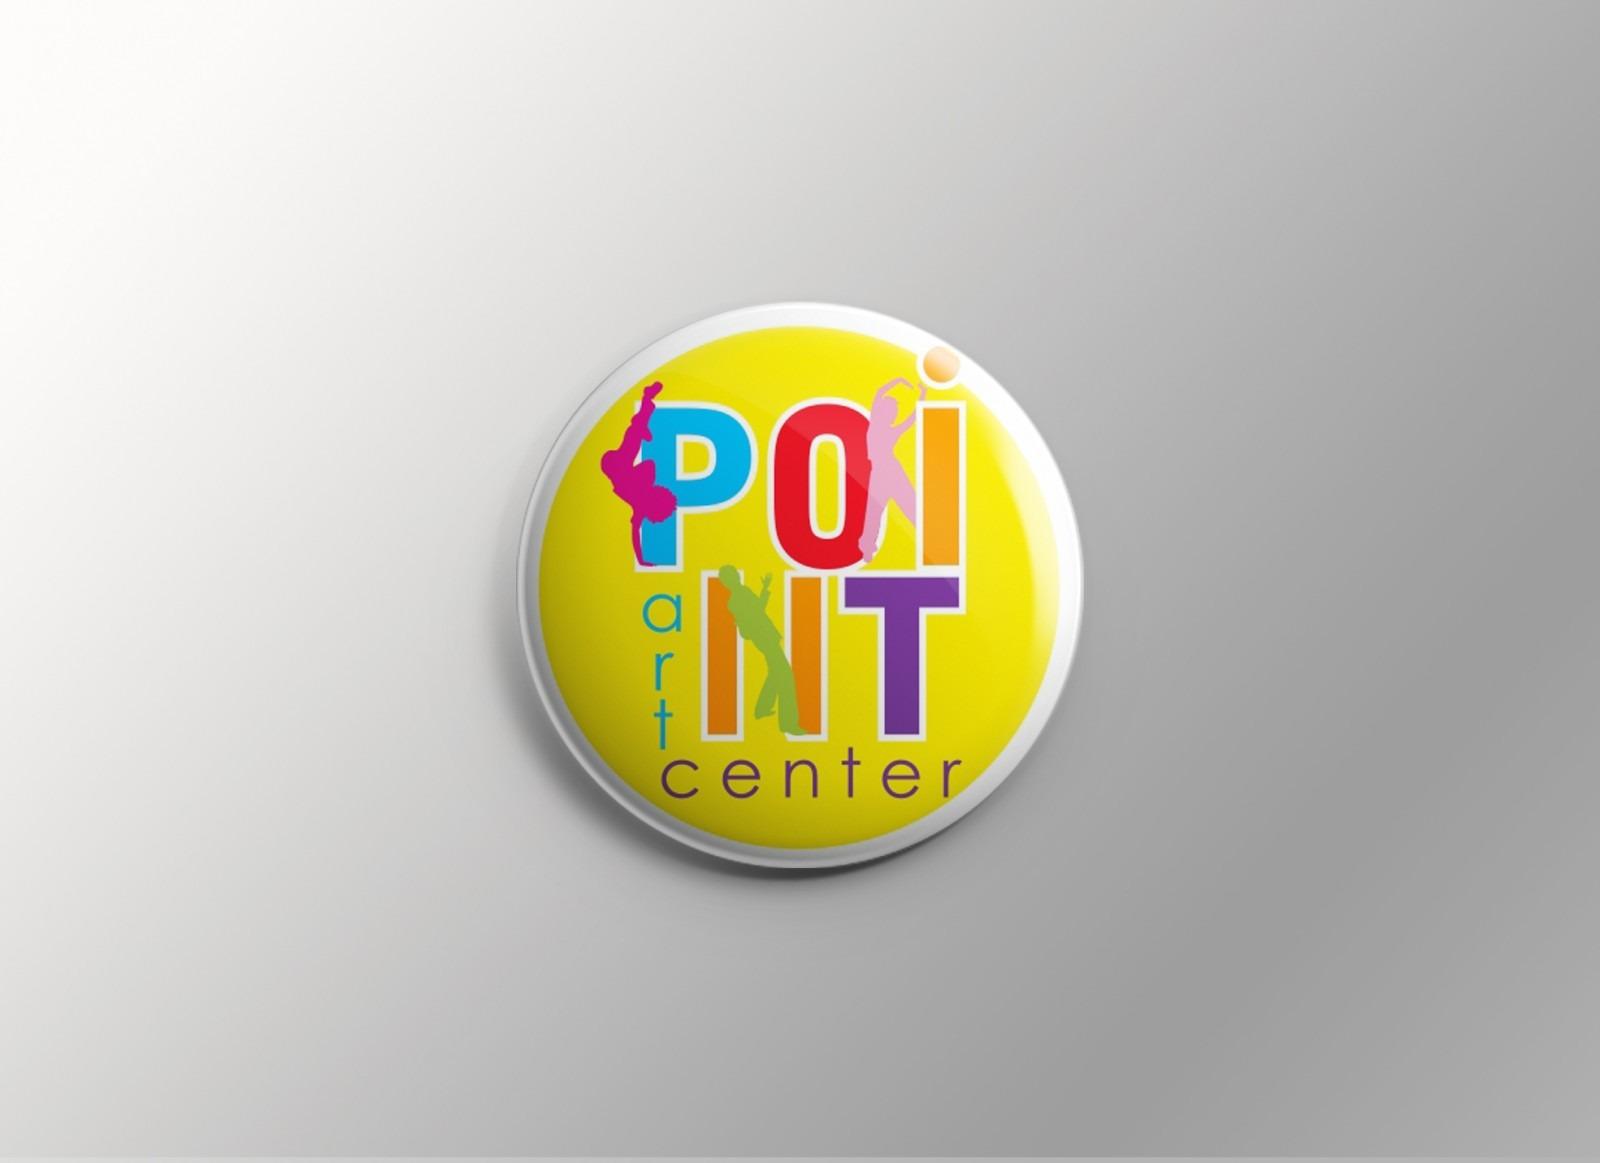 дизайн логотипа POINT 04